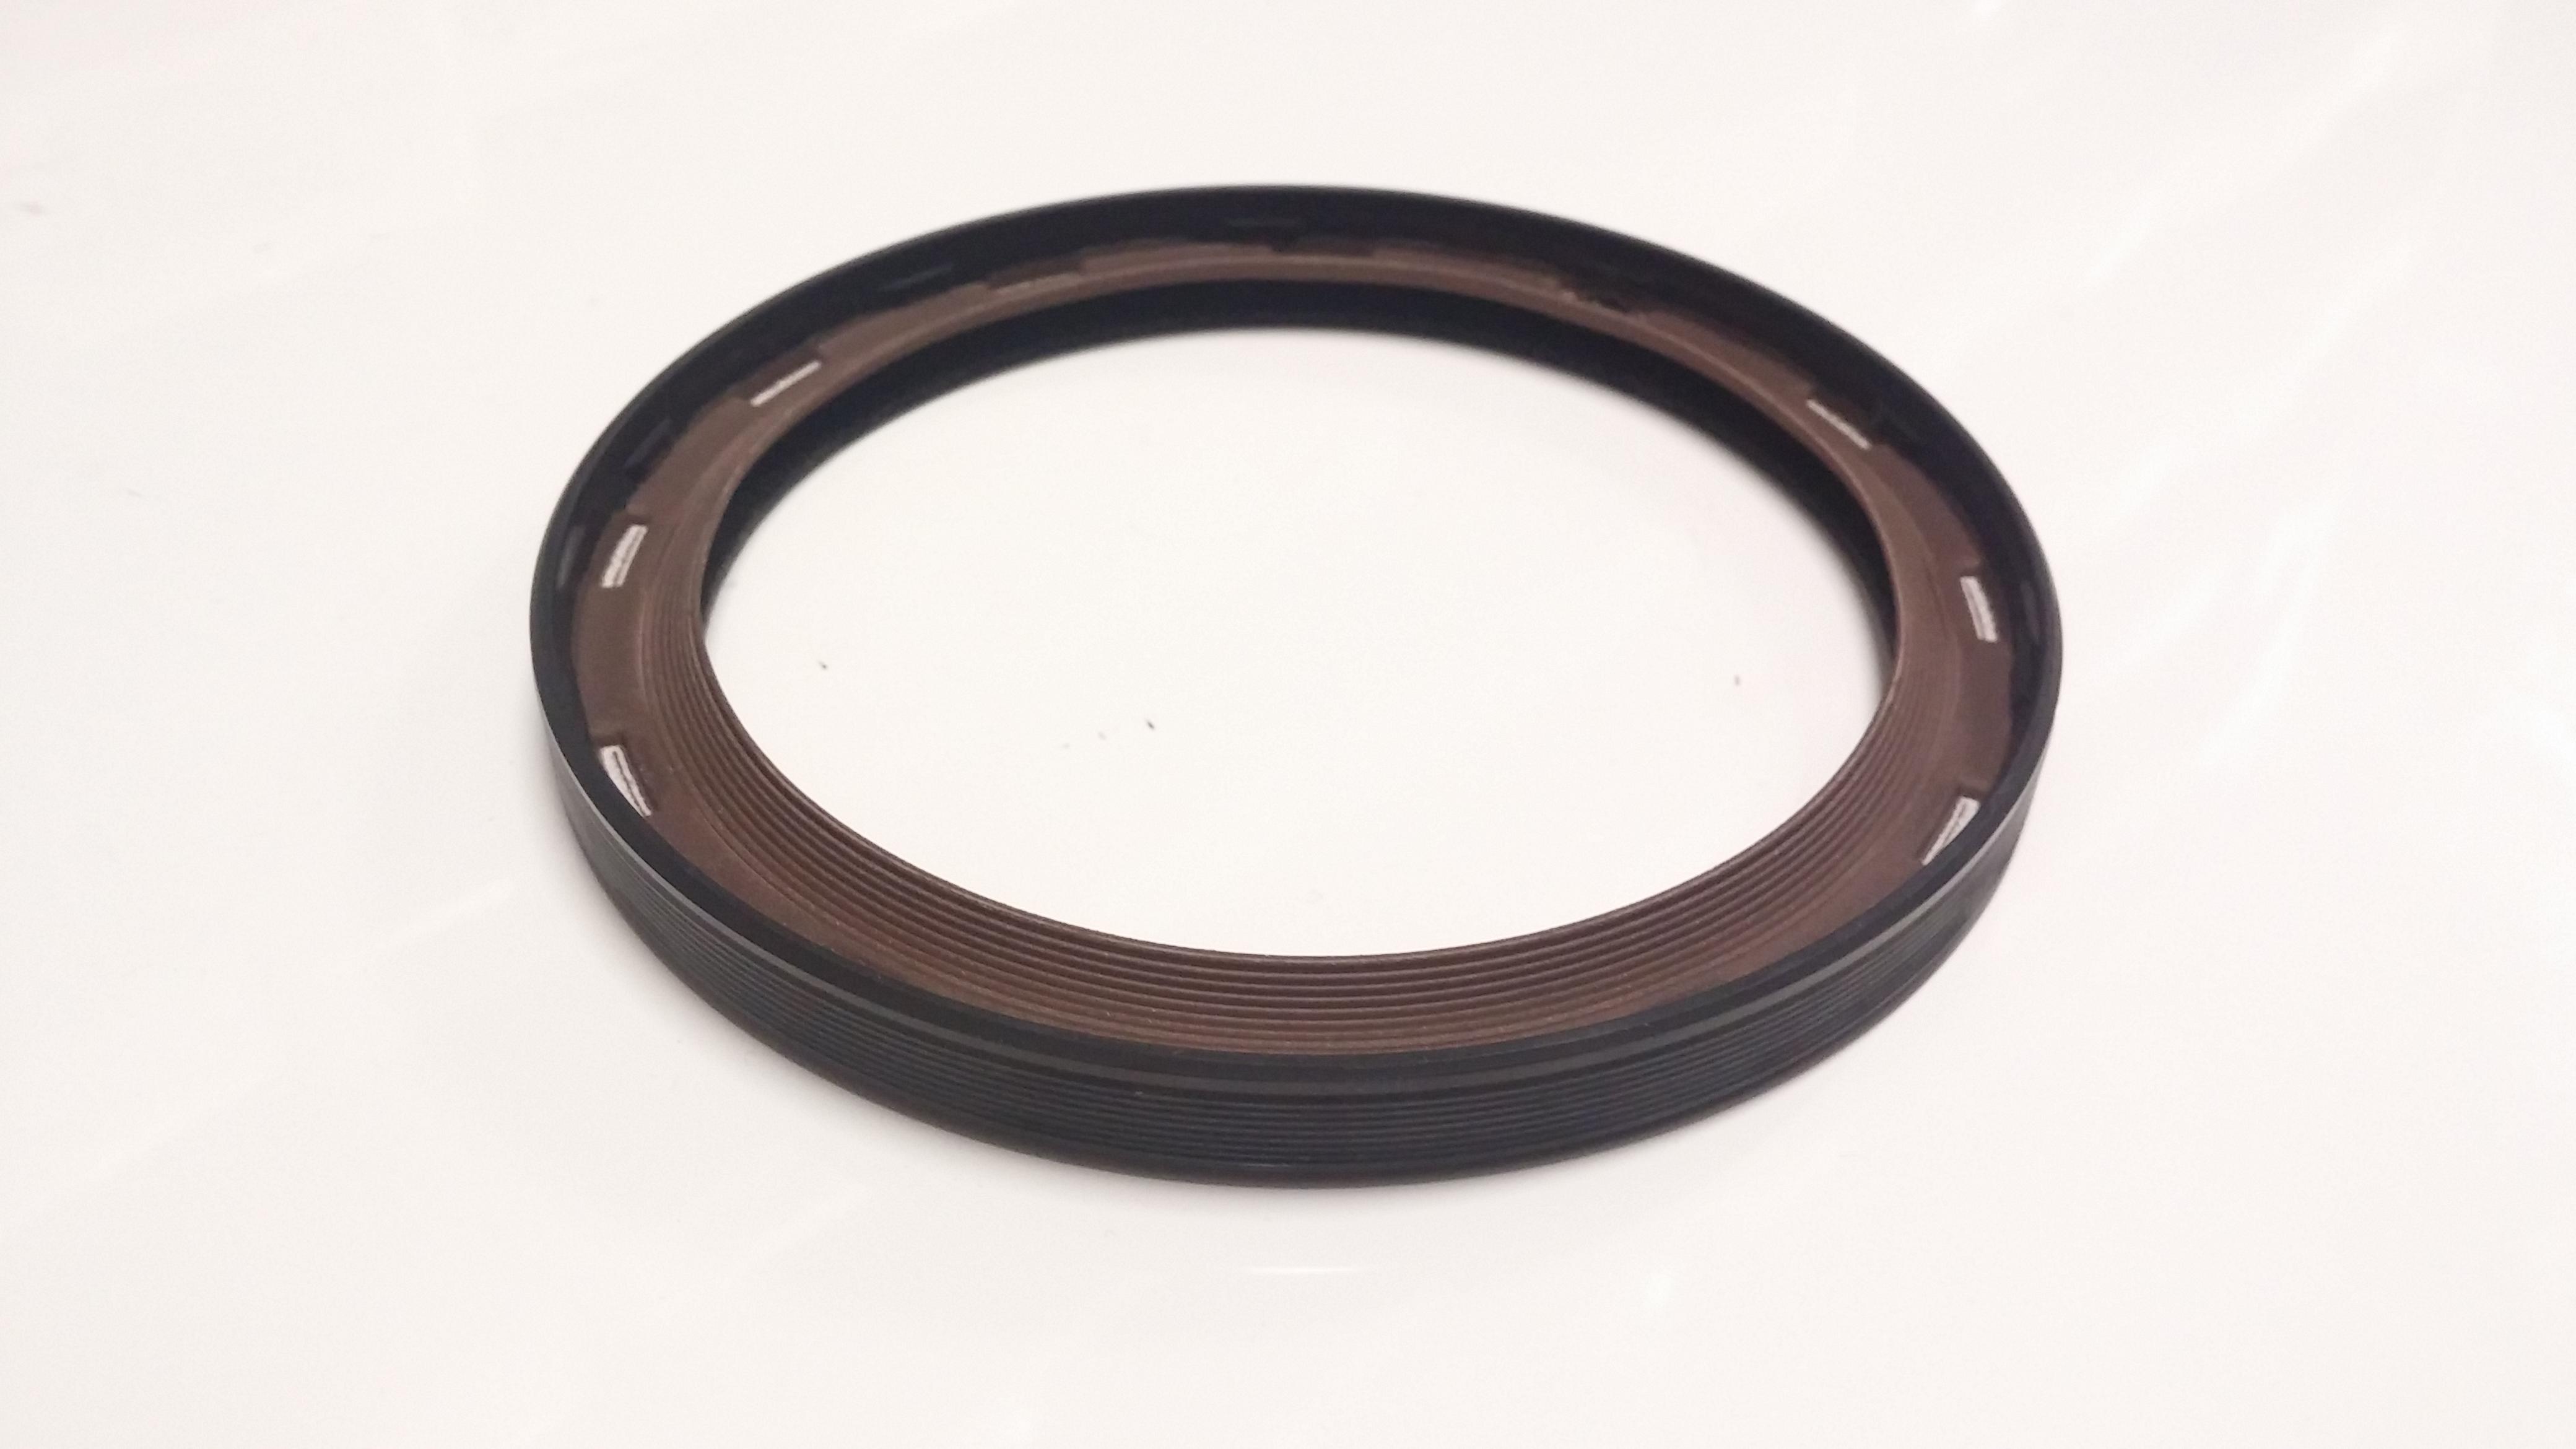 30731650 - Volvo Sealing ring. Crank mechanism. Cancer, Harm, Reproductive   Smith Volvo, San ...